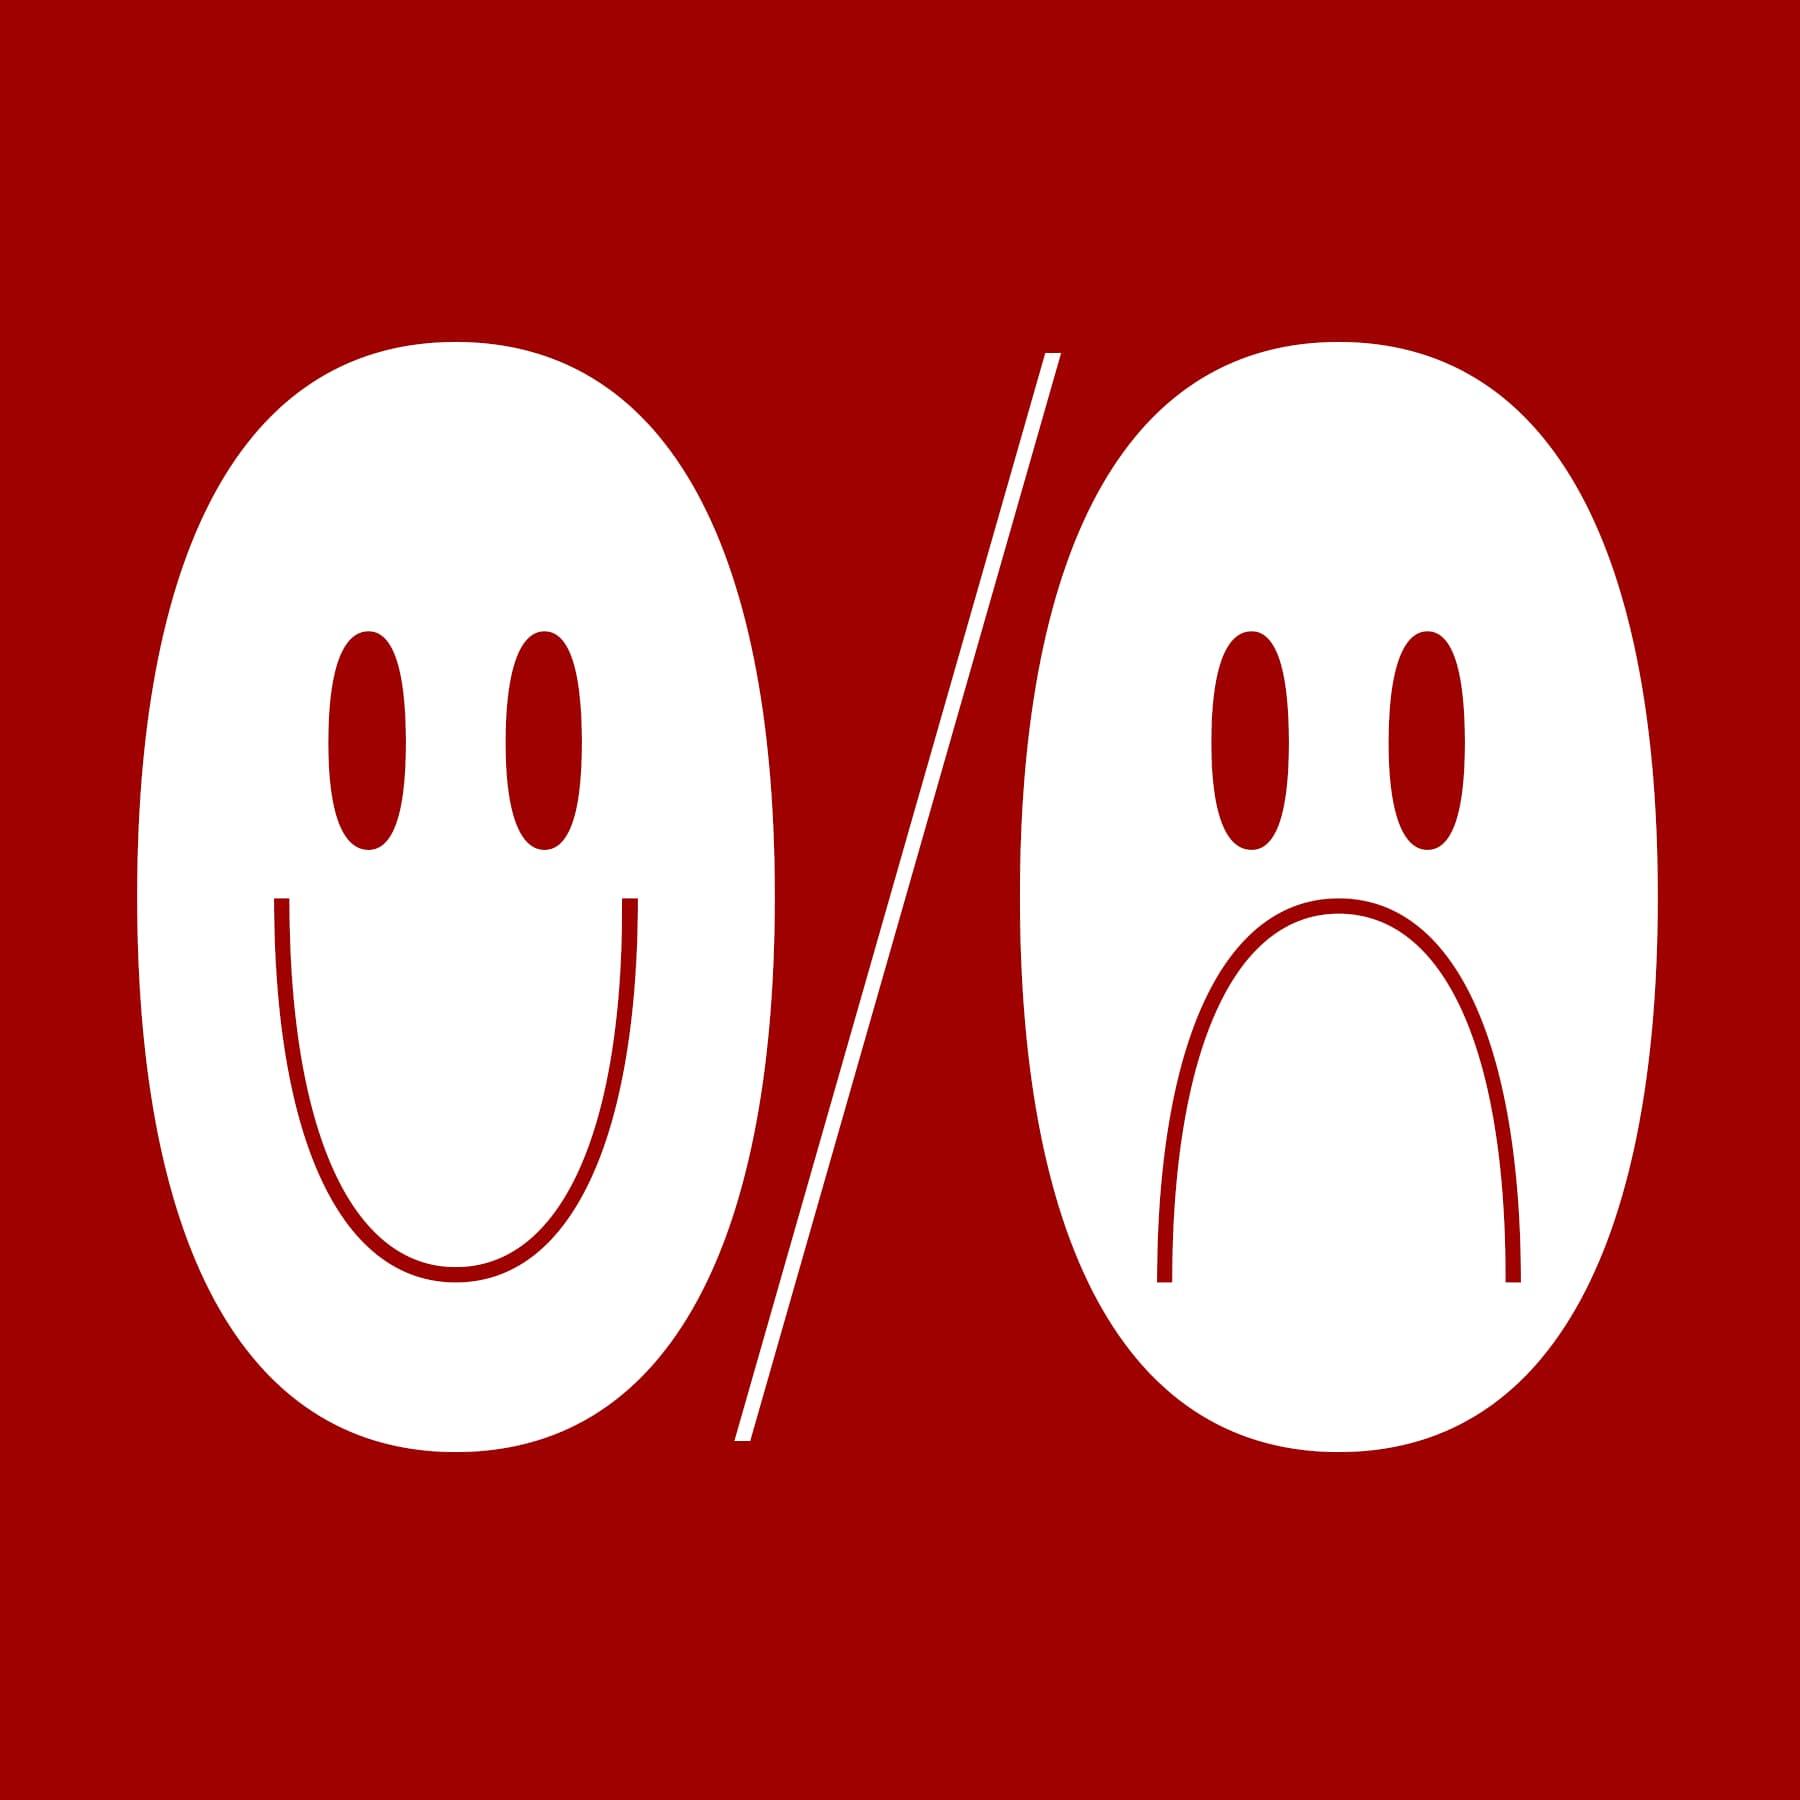 Entrevista David Suid W Type Foundry Emojis Friends